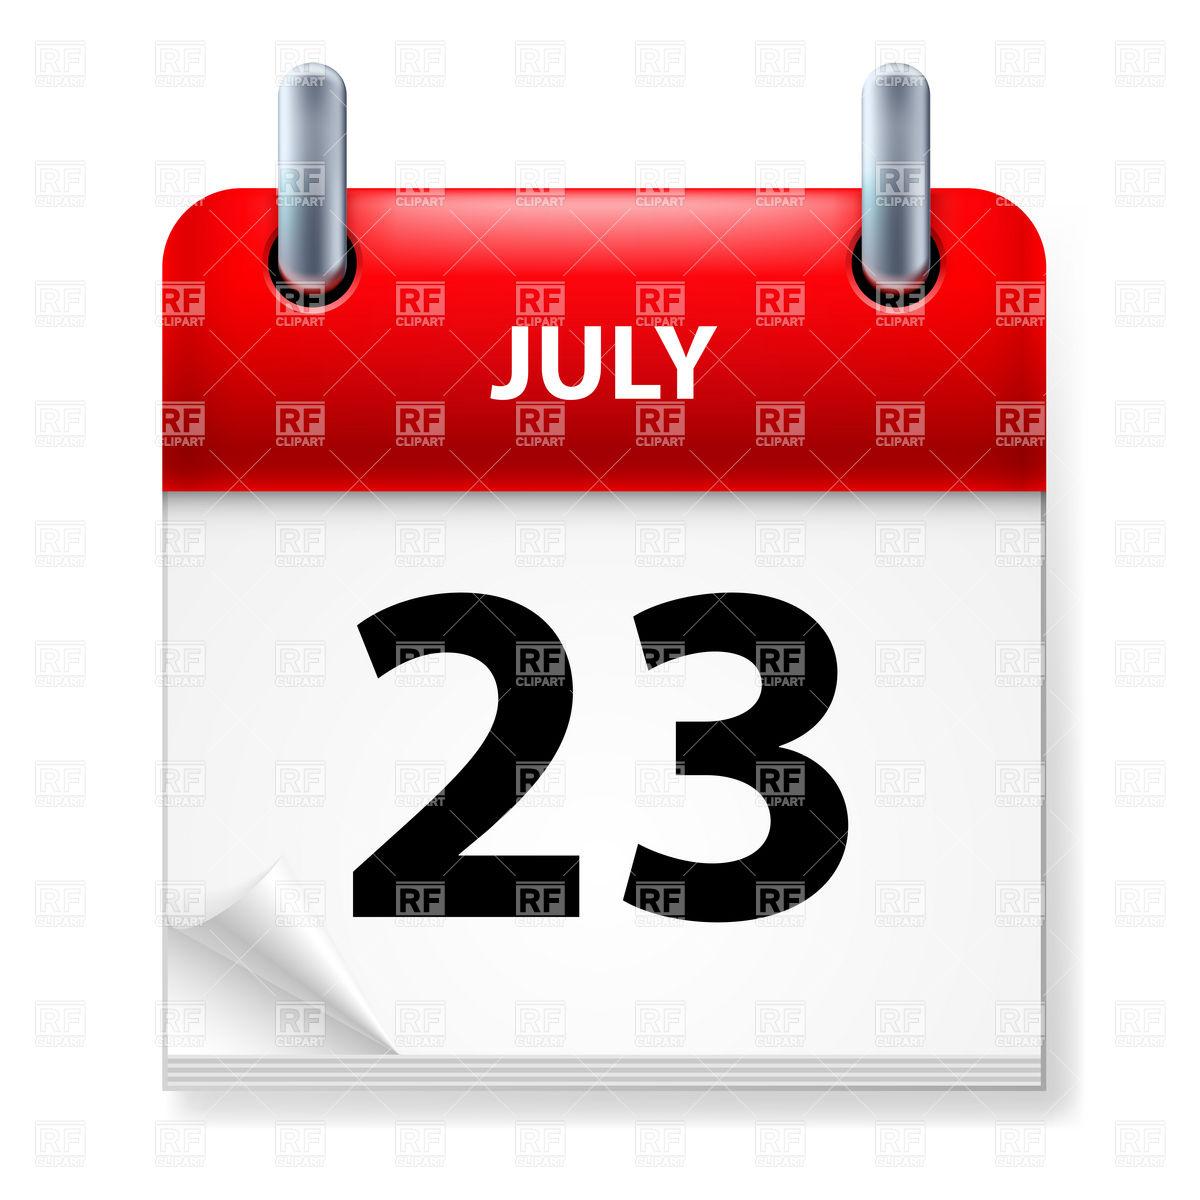 July_23.jpg